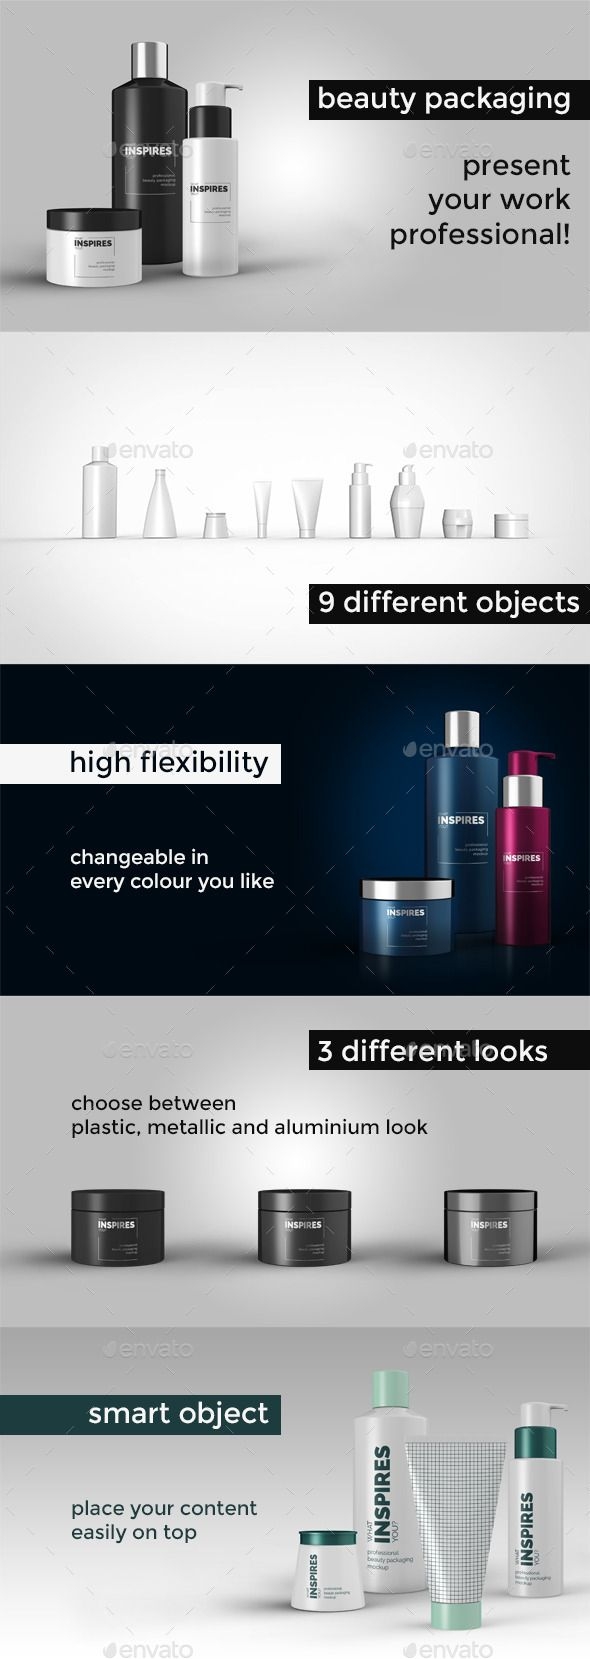 Beauty Packaging Mockup - Beauty Packaging